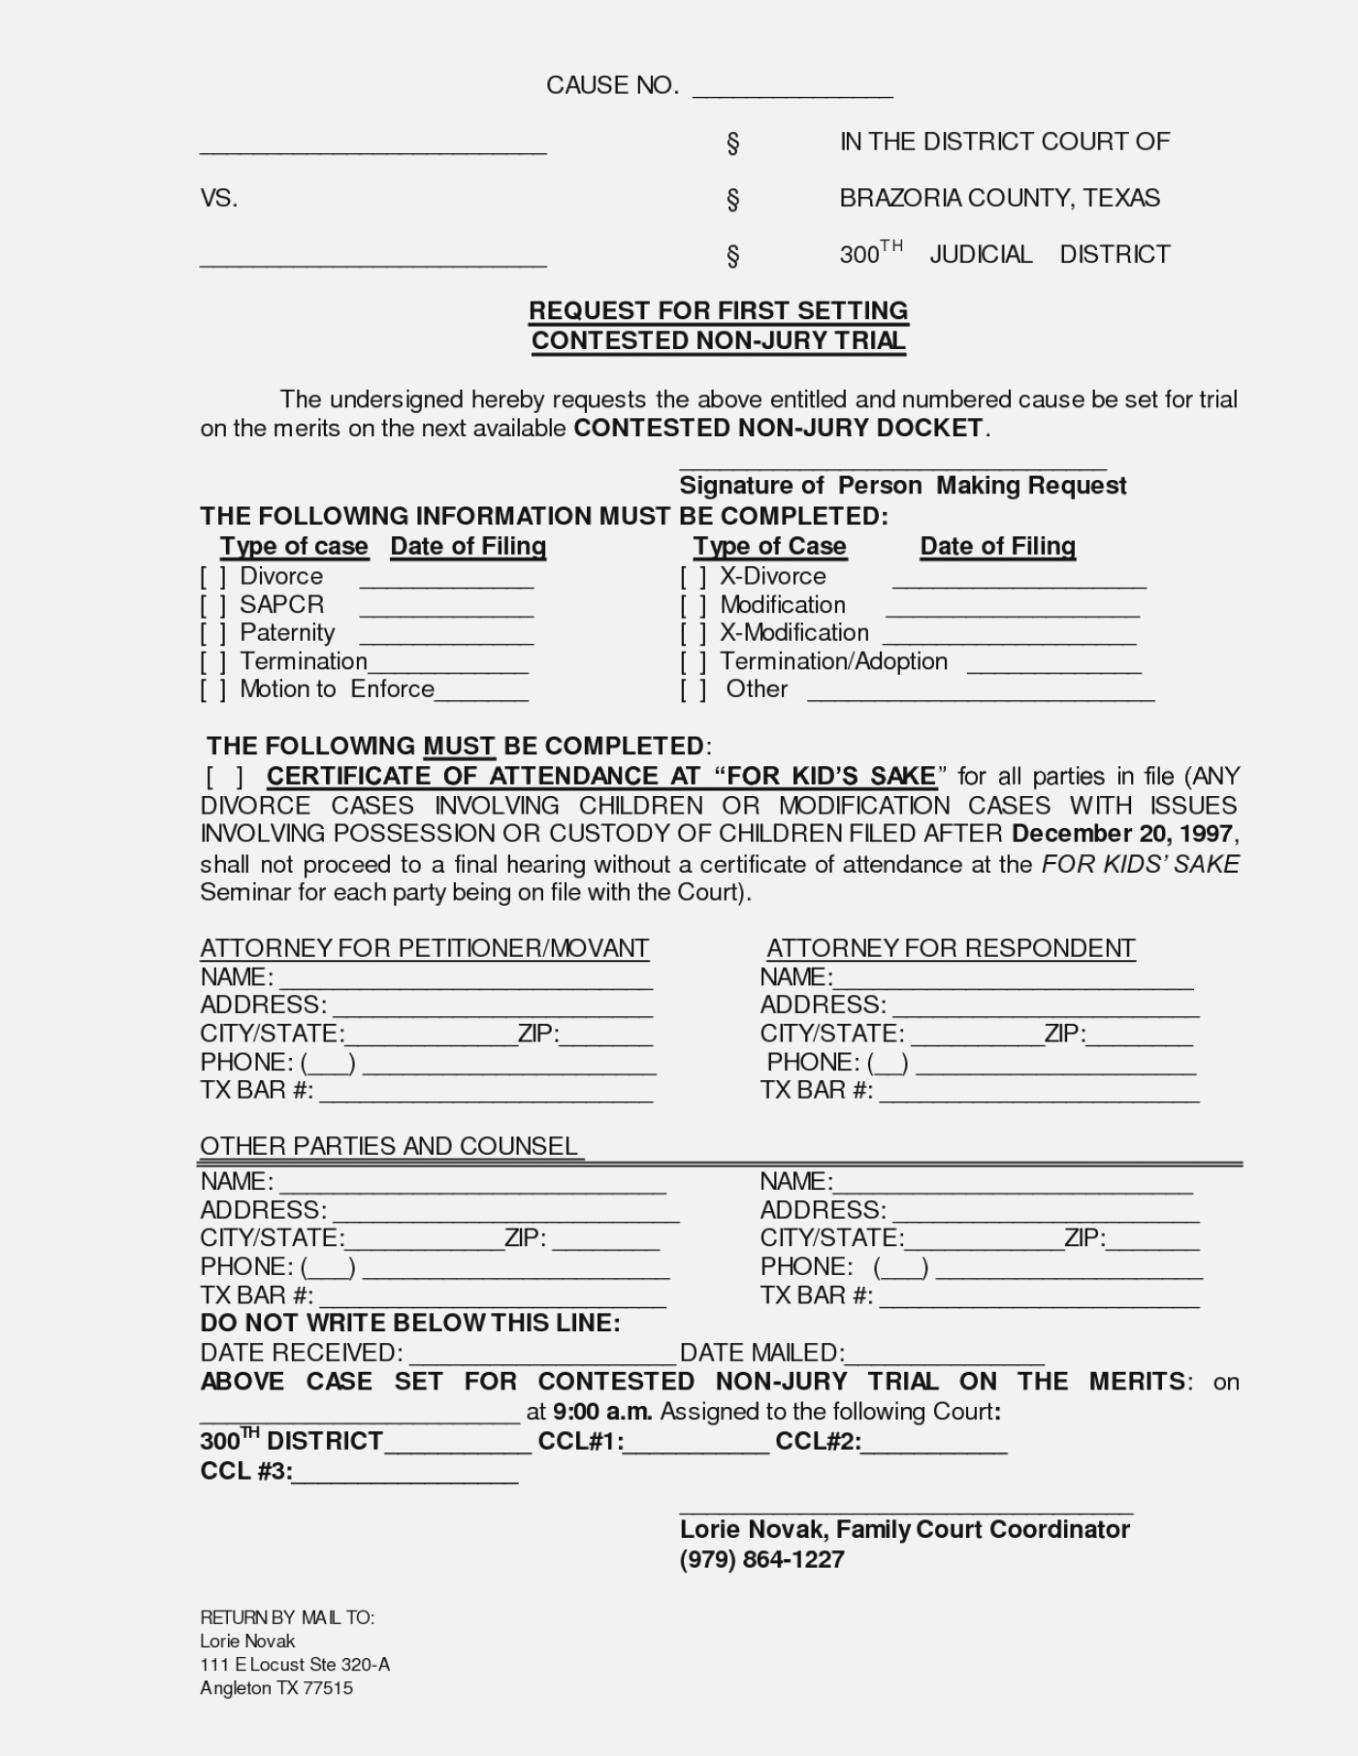 Free Printable Nj Divorce Forms - Free Printable Nj Divorce Forms